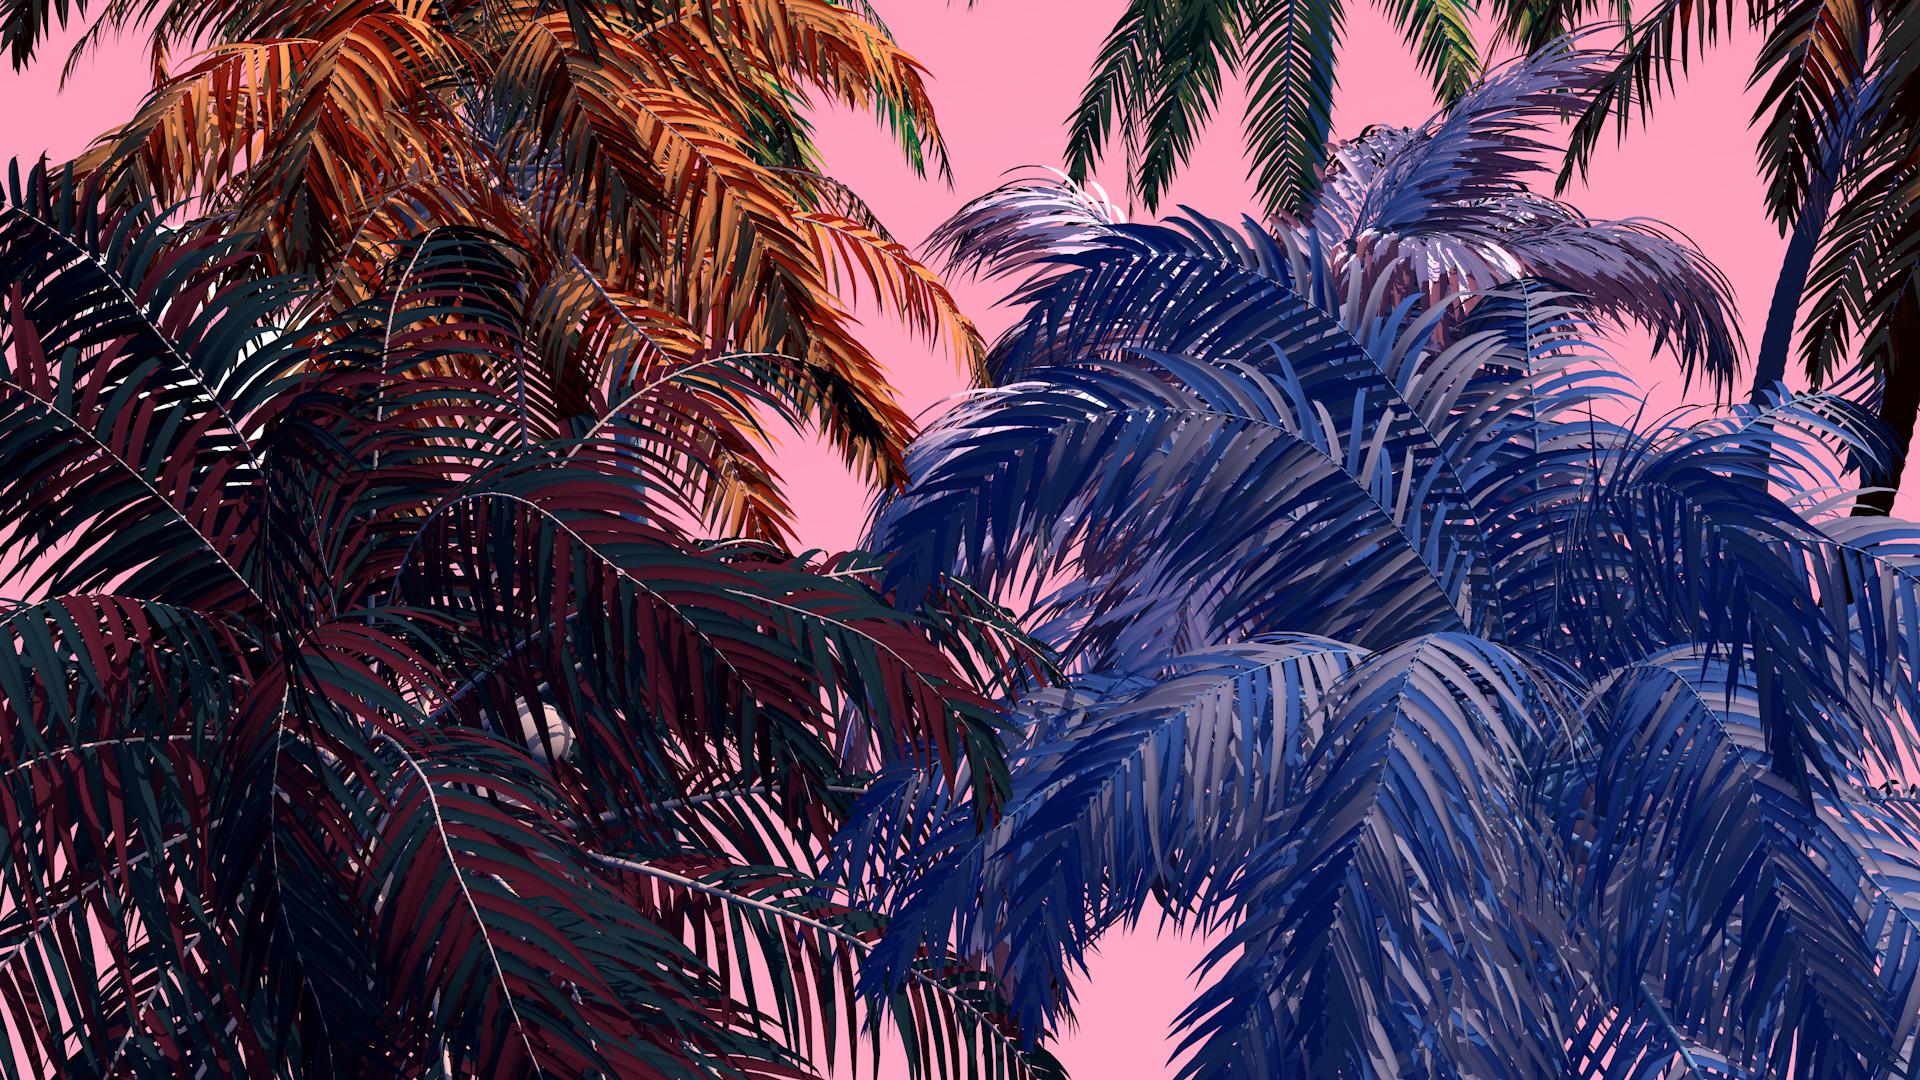 landscape6_palm_zoomIn_0000